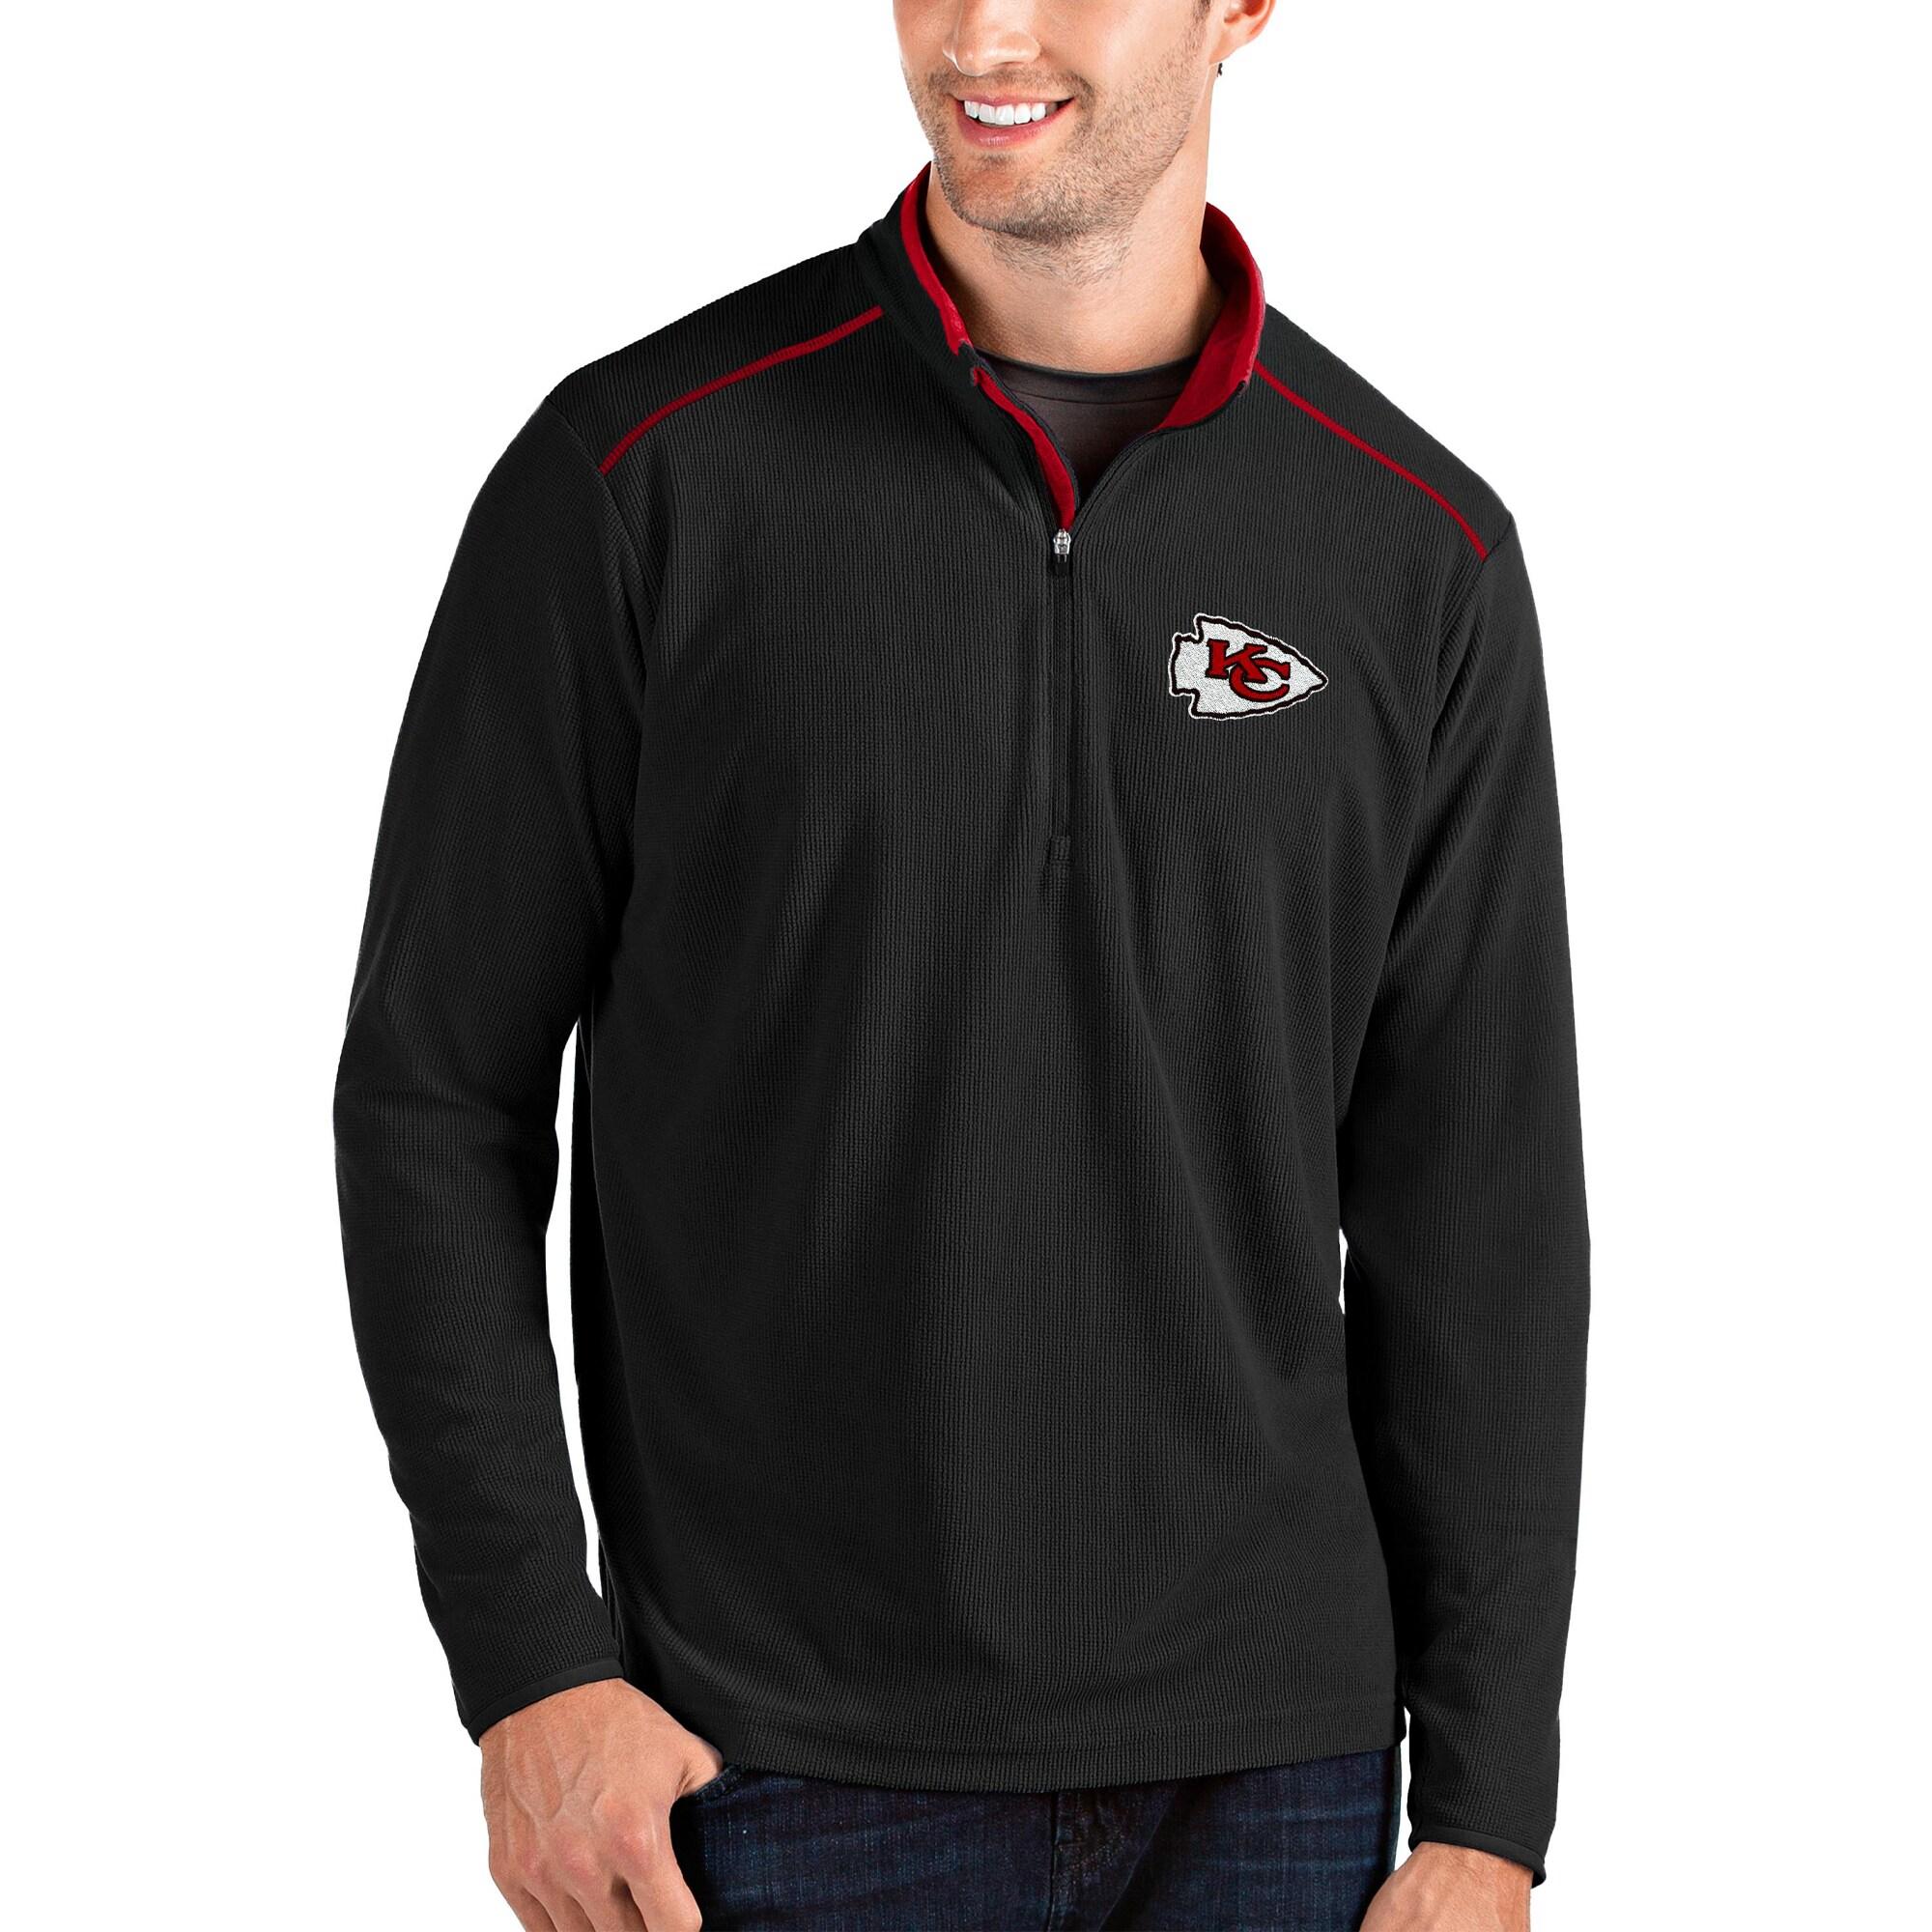 Kansas City Chiefs Antigua Glacier Quarter-Zip Pullover Jacket - Black/Red